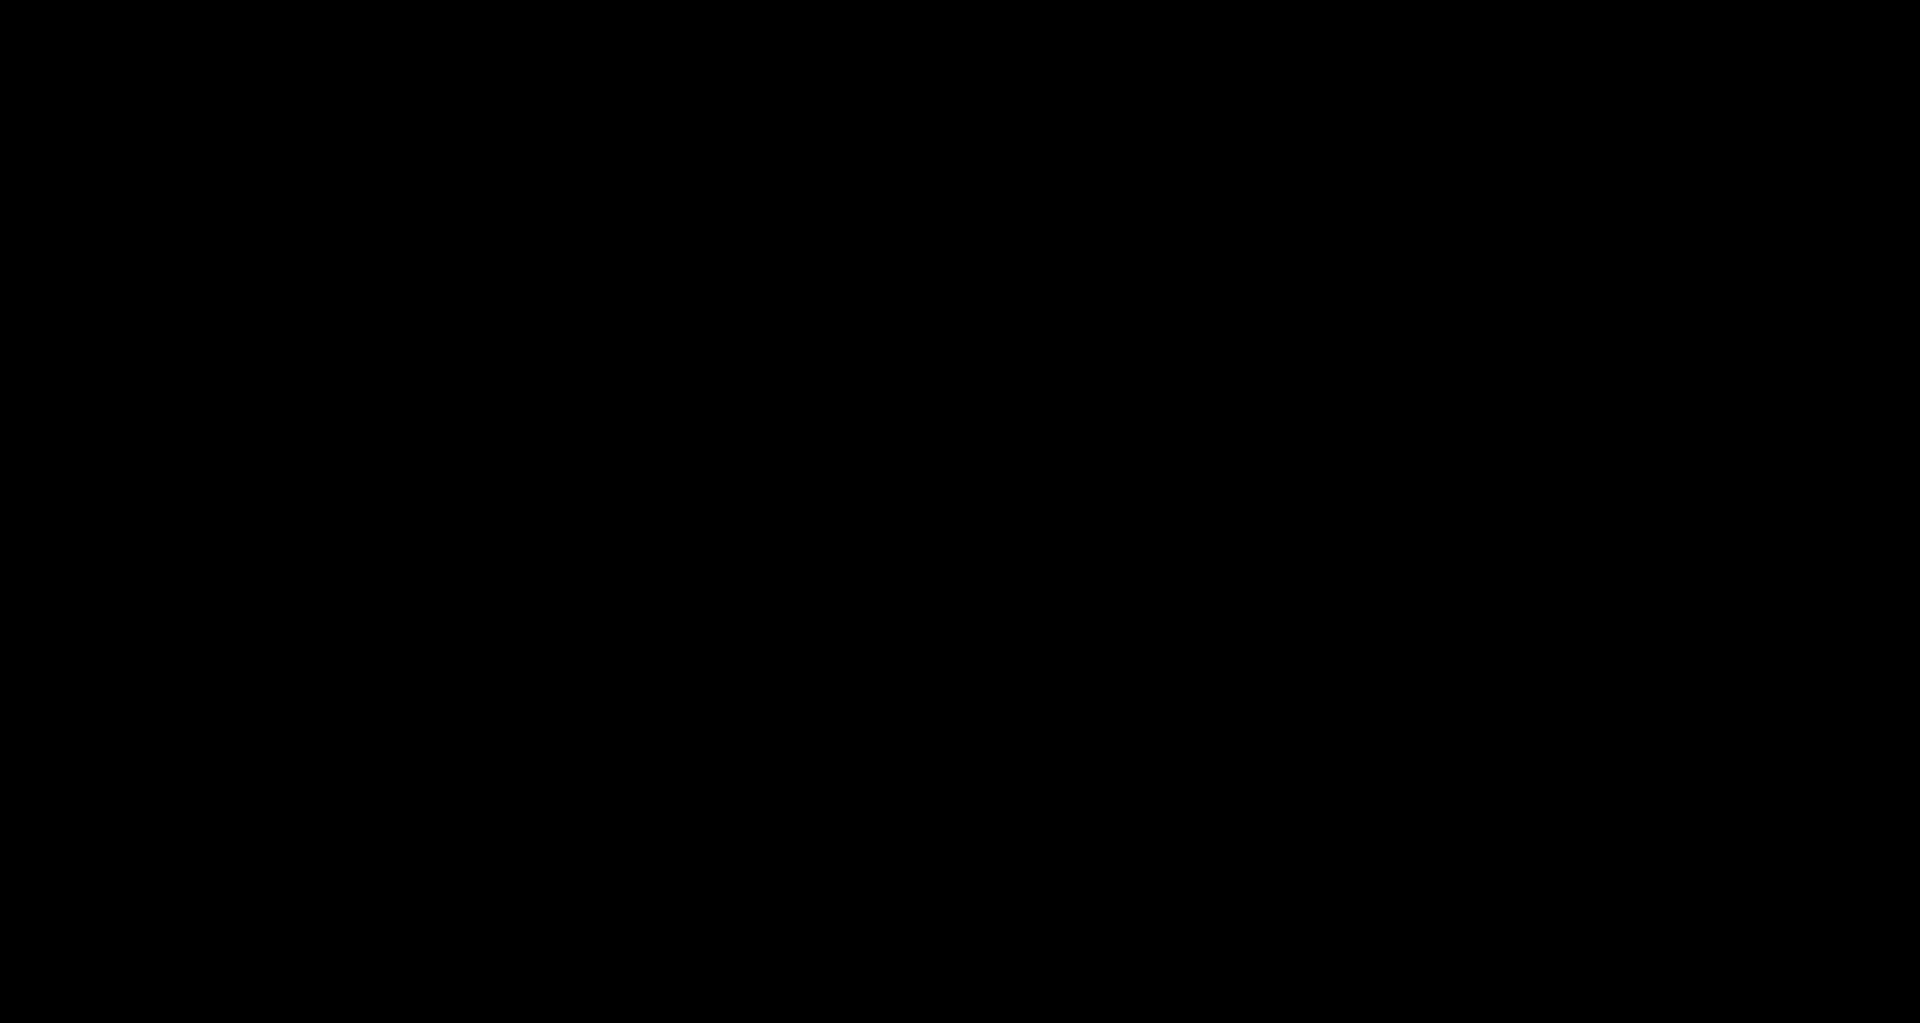 logo træner akademiet